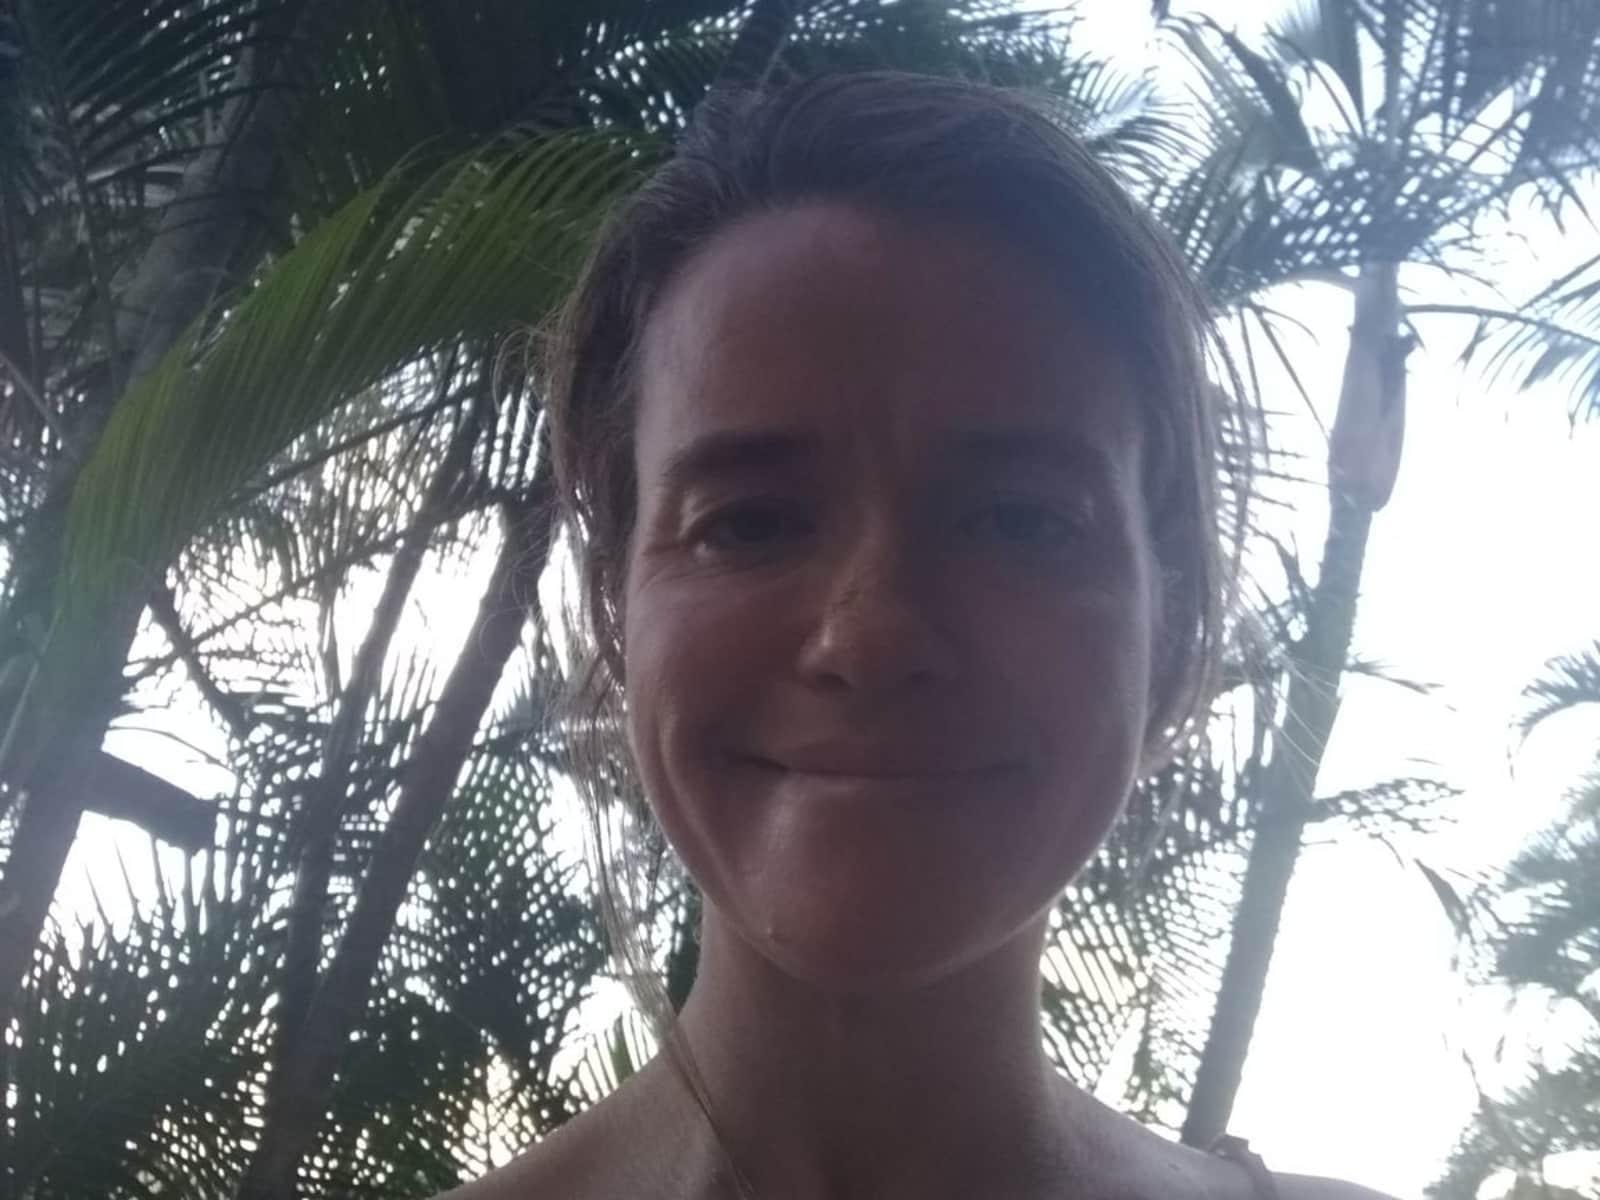 Gina from Kahului, Hawaii, United States